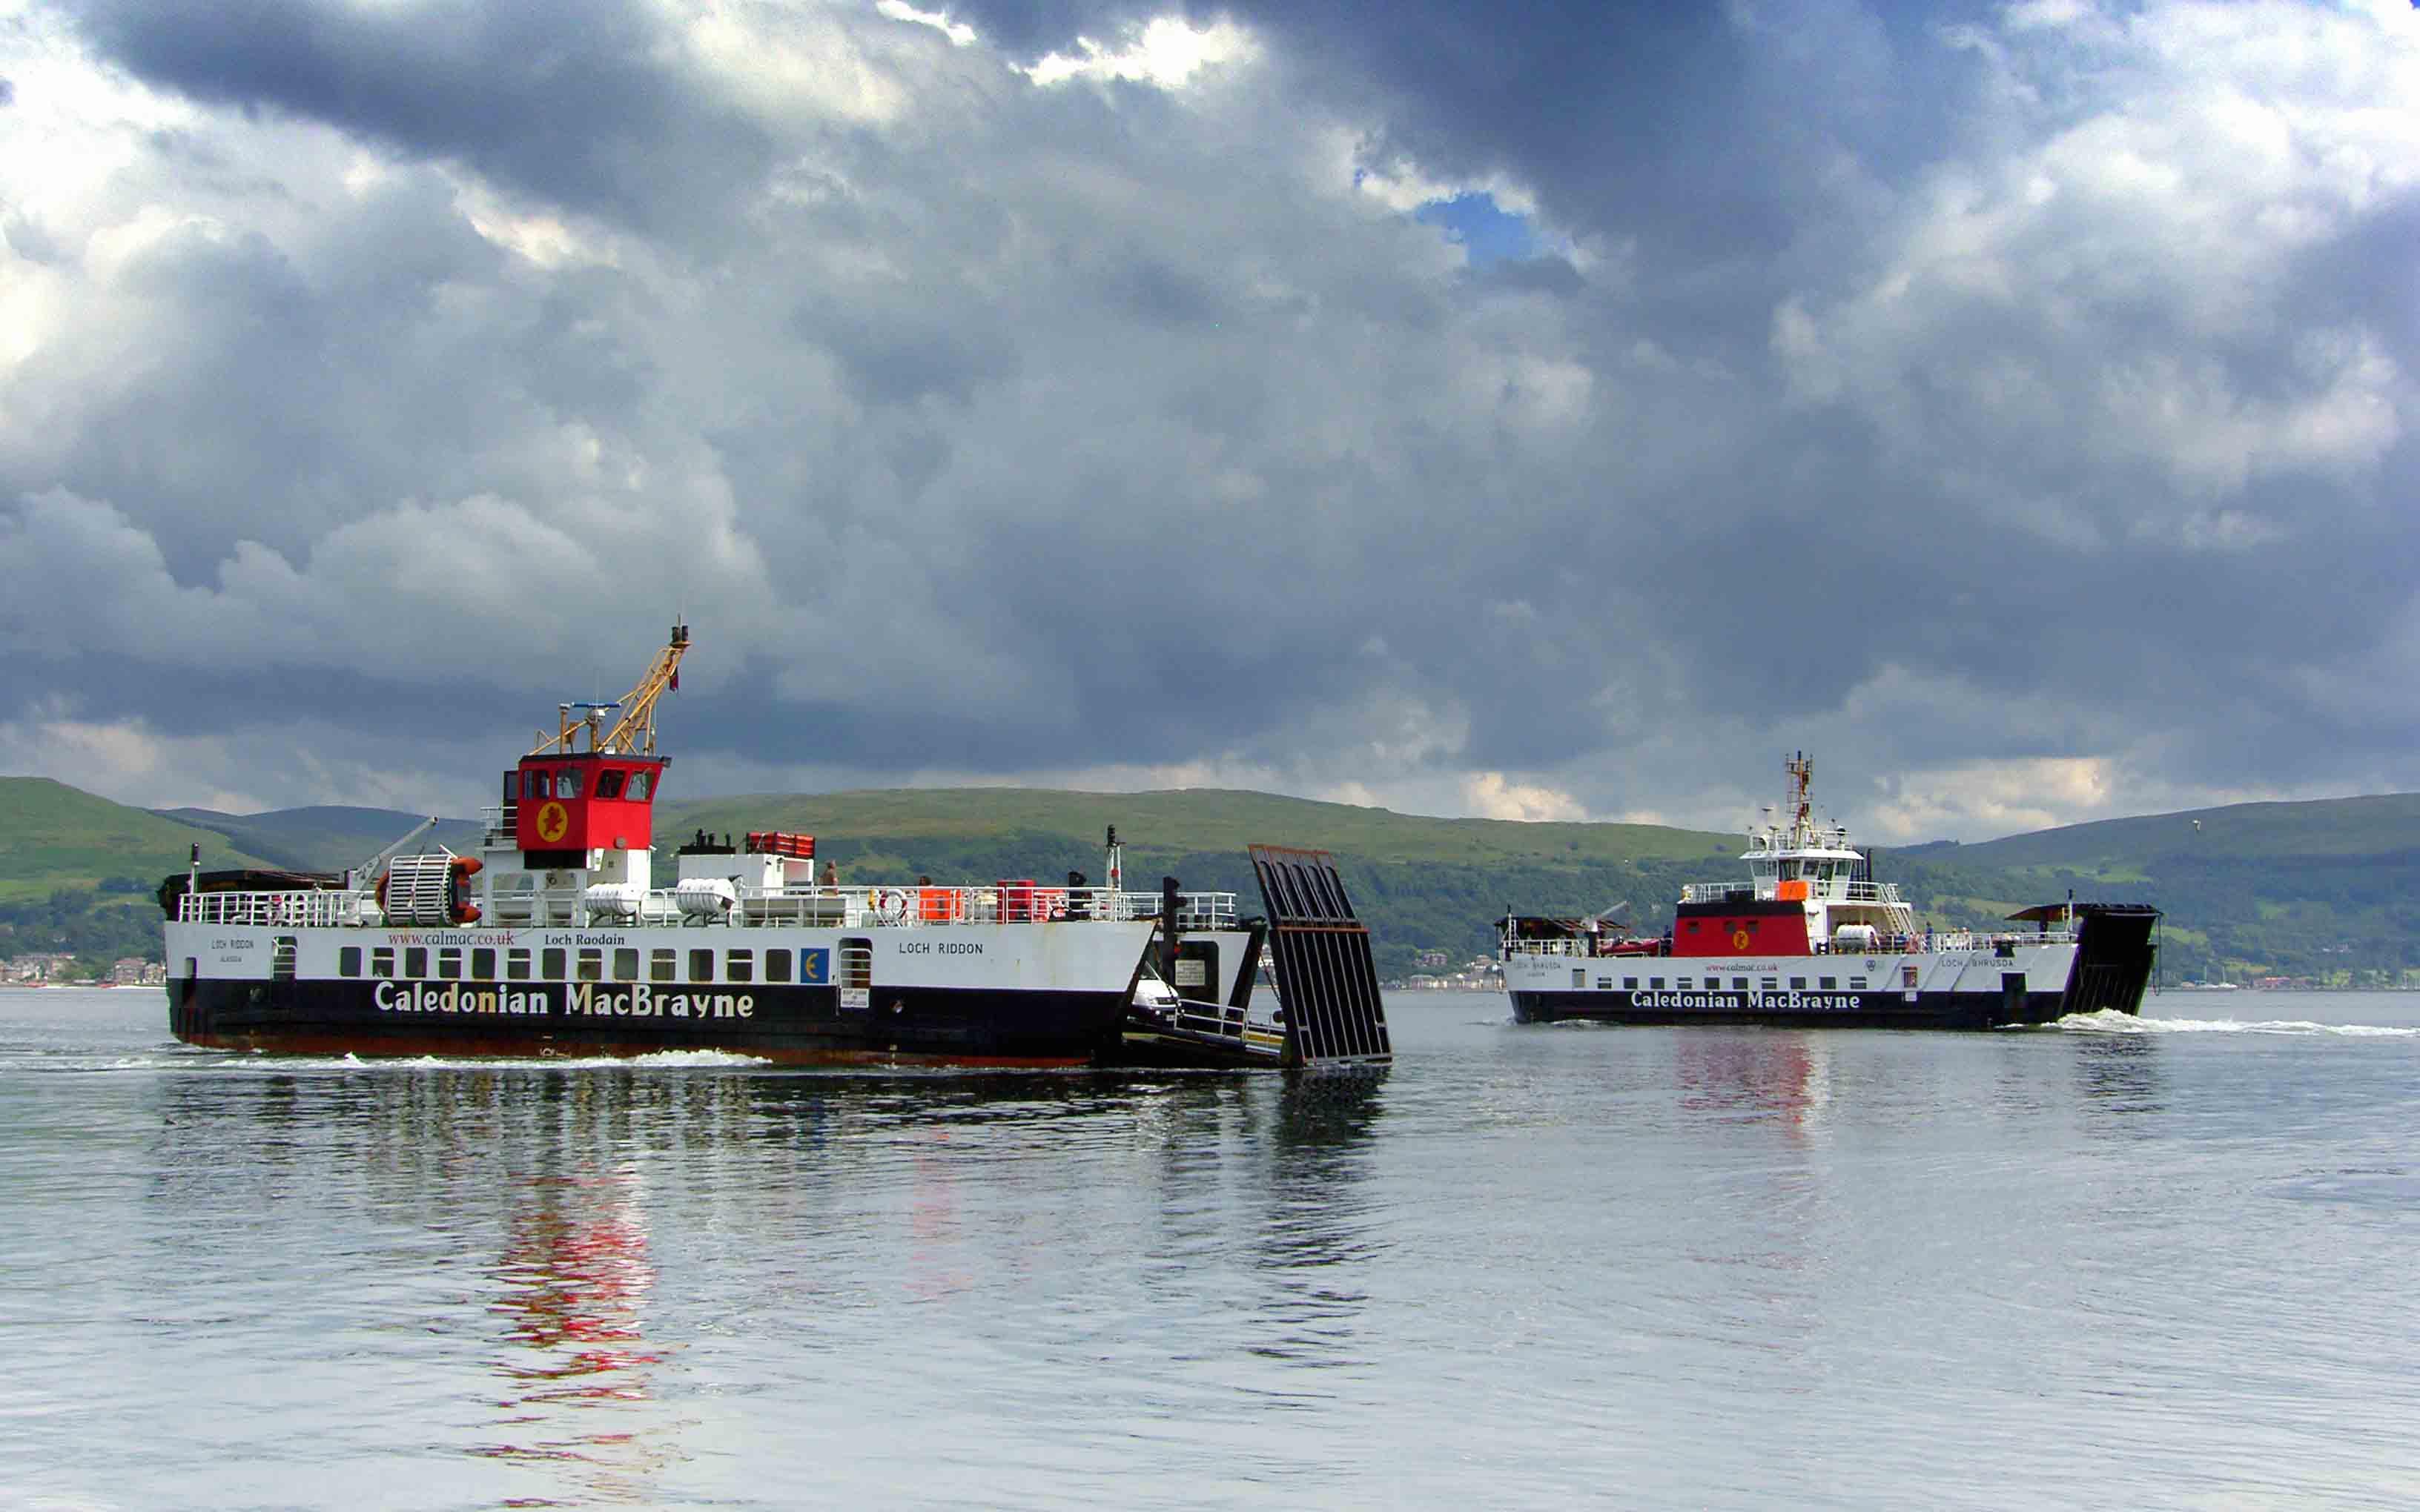 Loch Riddon and Loch Bhrusda off Cumbrae Slip (Ships of CalMac)